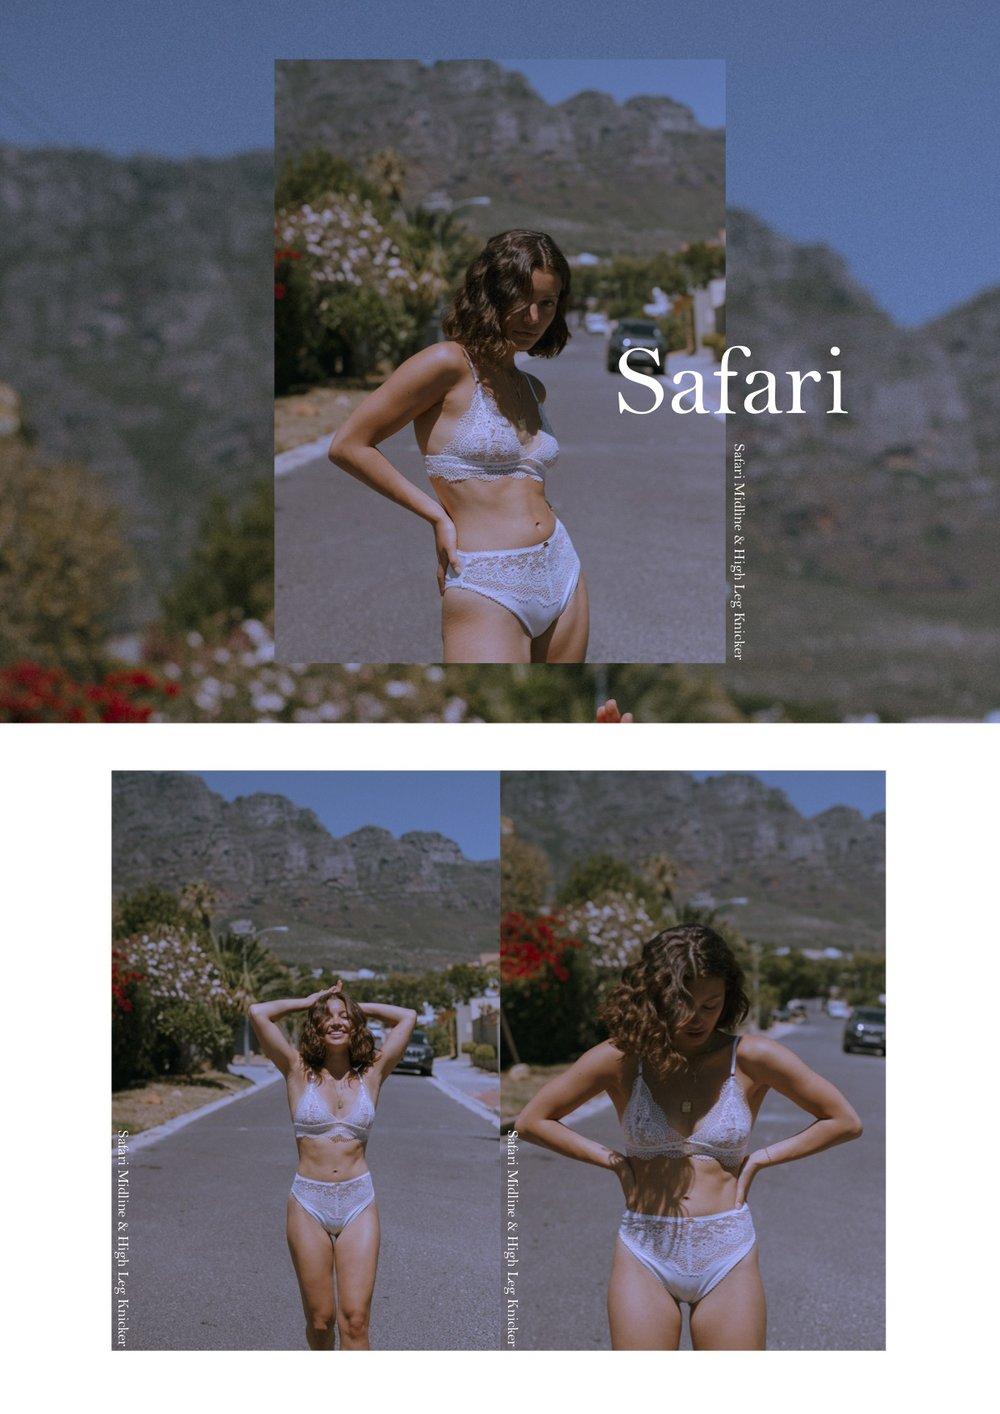 Safari 1.jpg